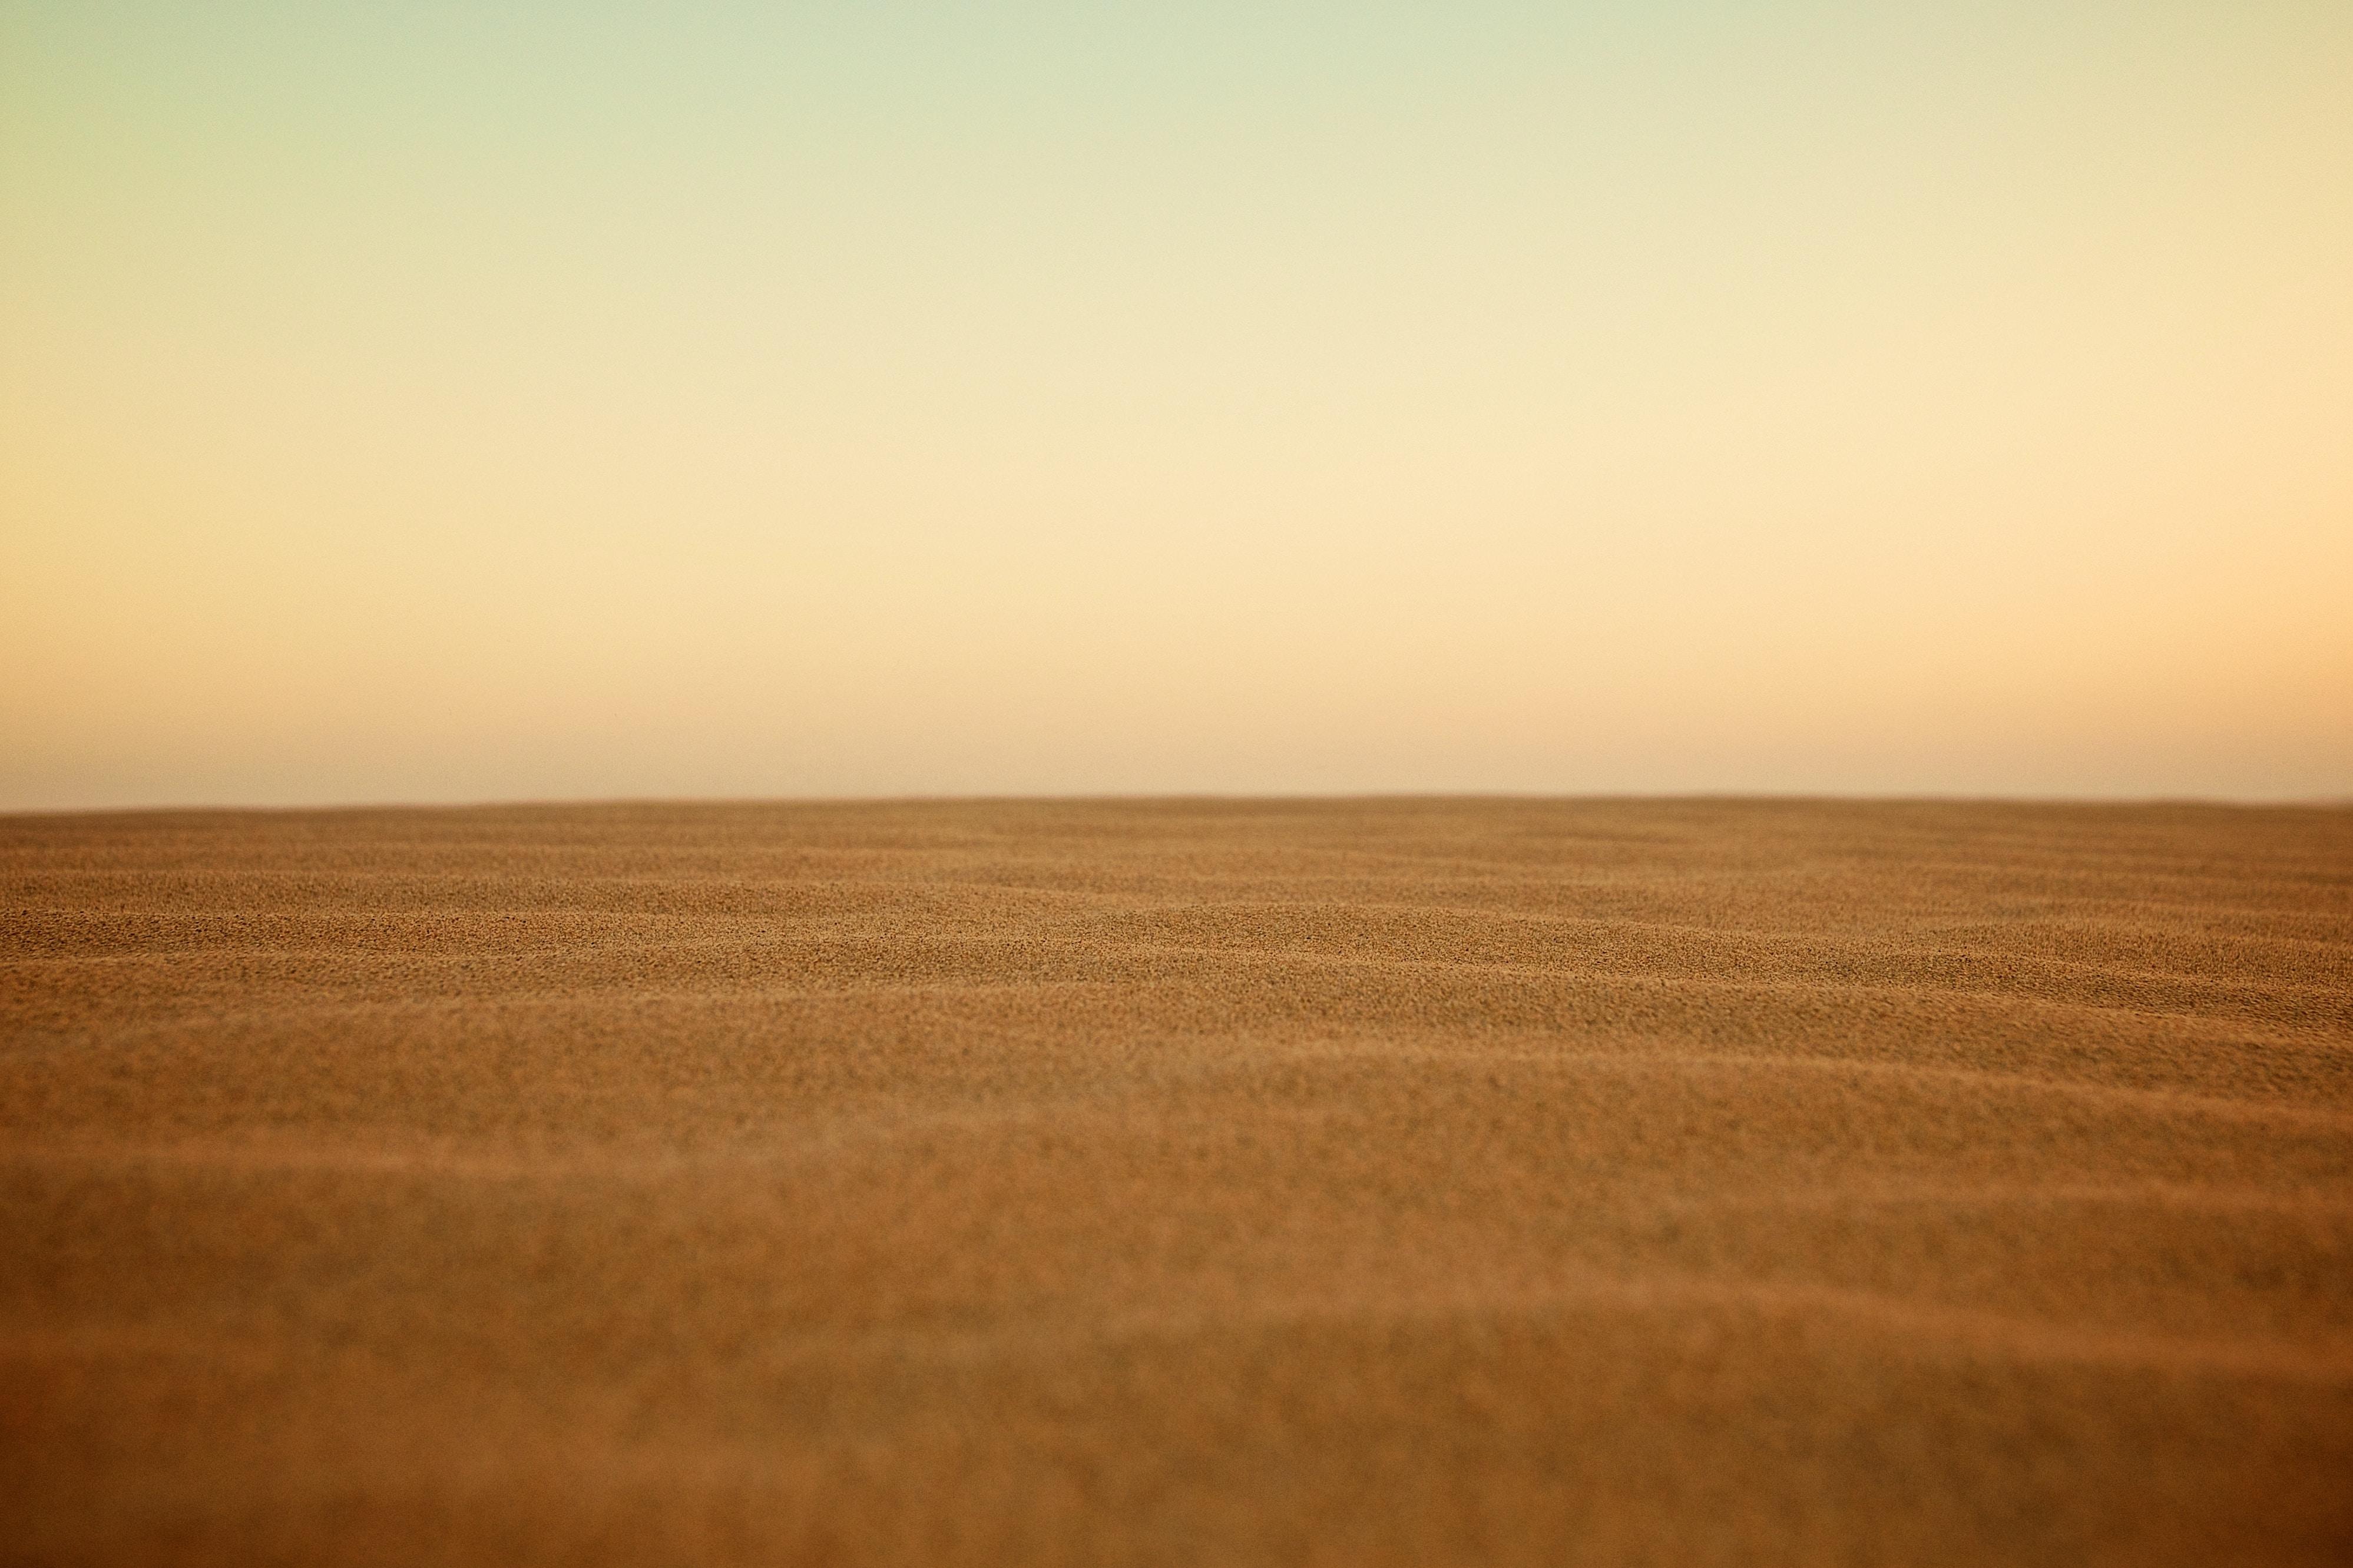 pustynia; źródło: Unsplash